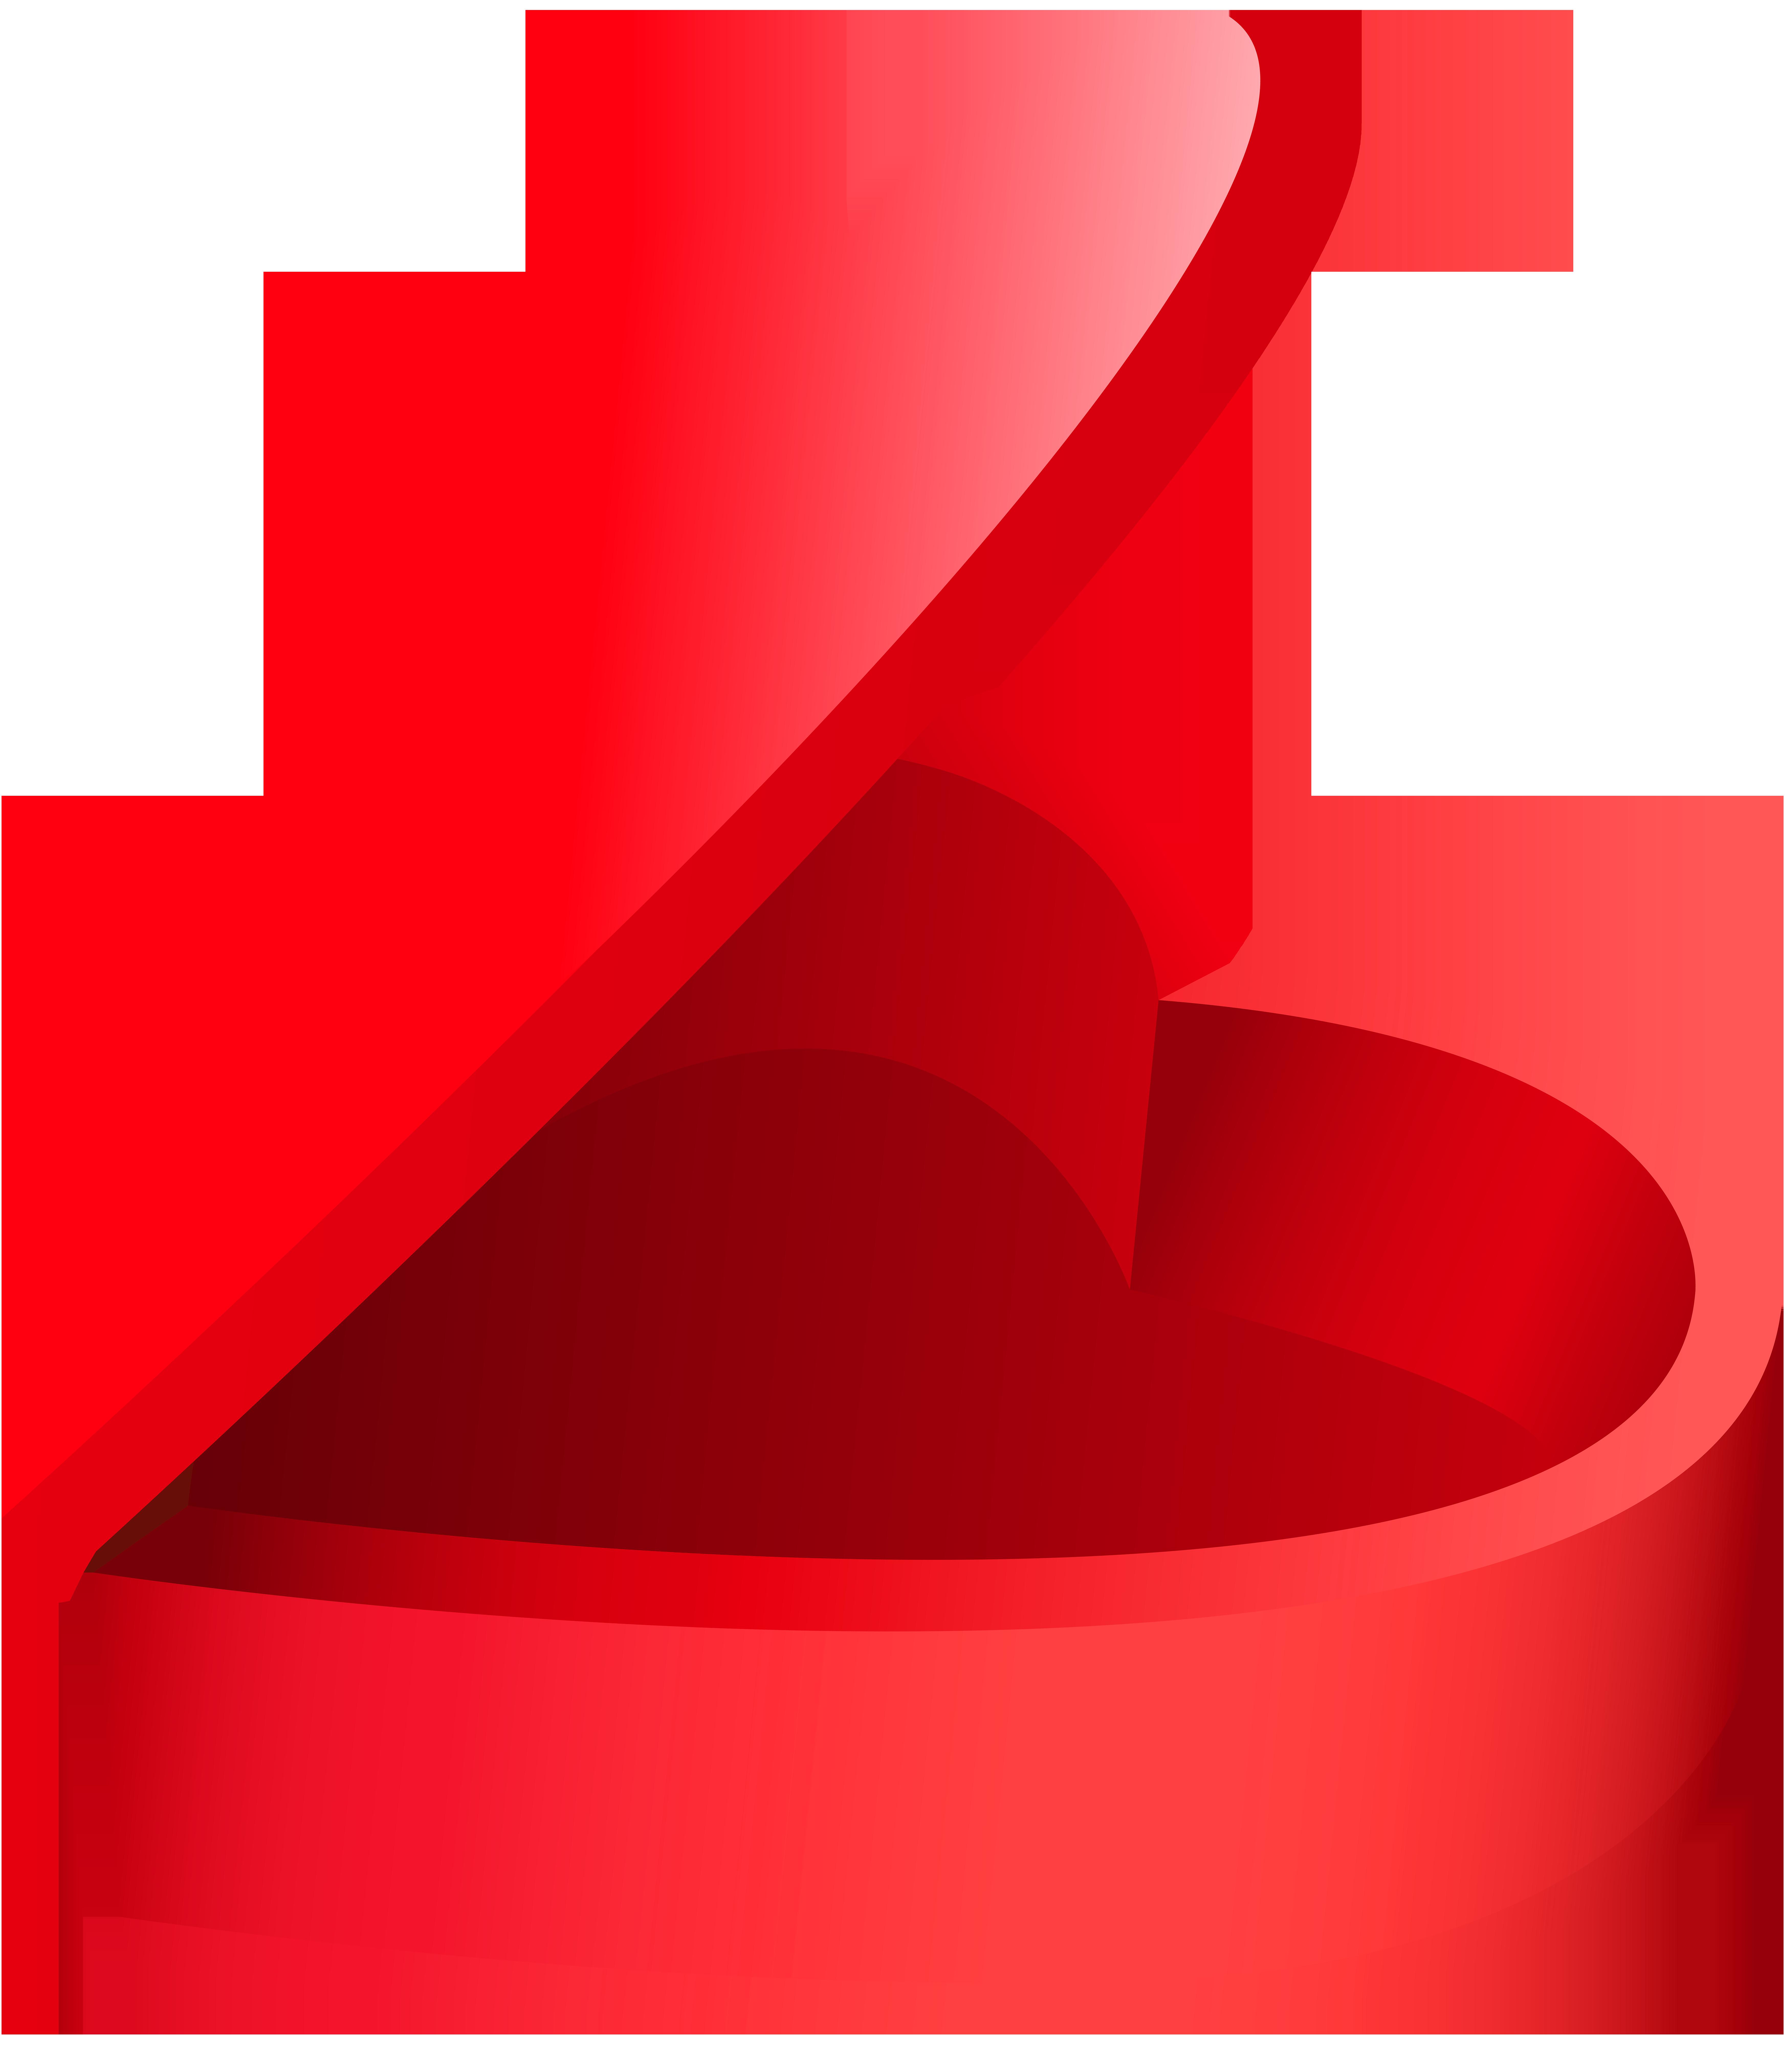 Red box transparent clip. Piano clipart heart